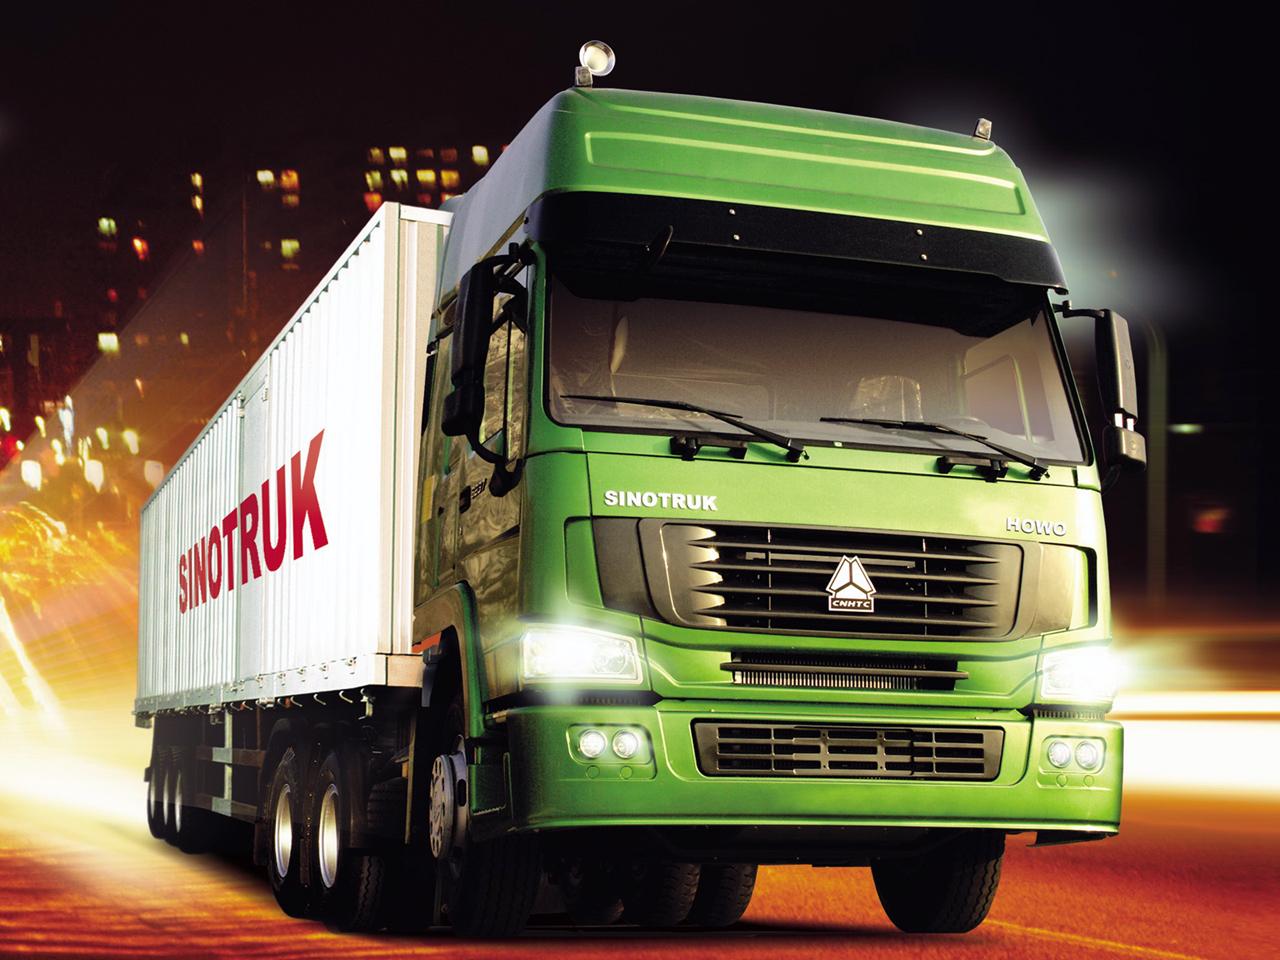 Сегмент тяжелых грузовиков компании SINOTRUK